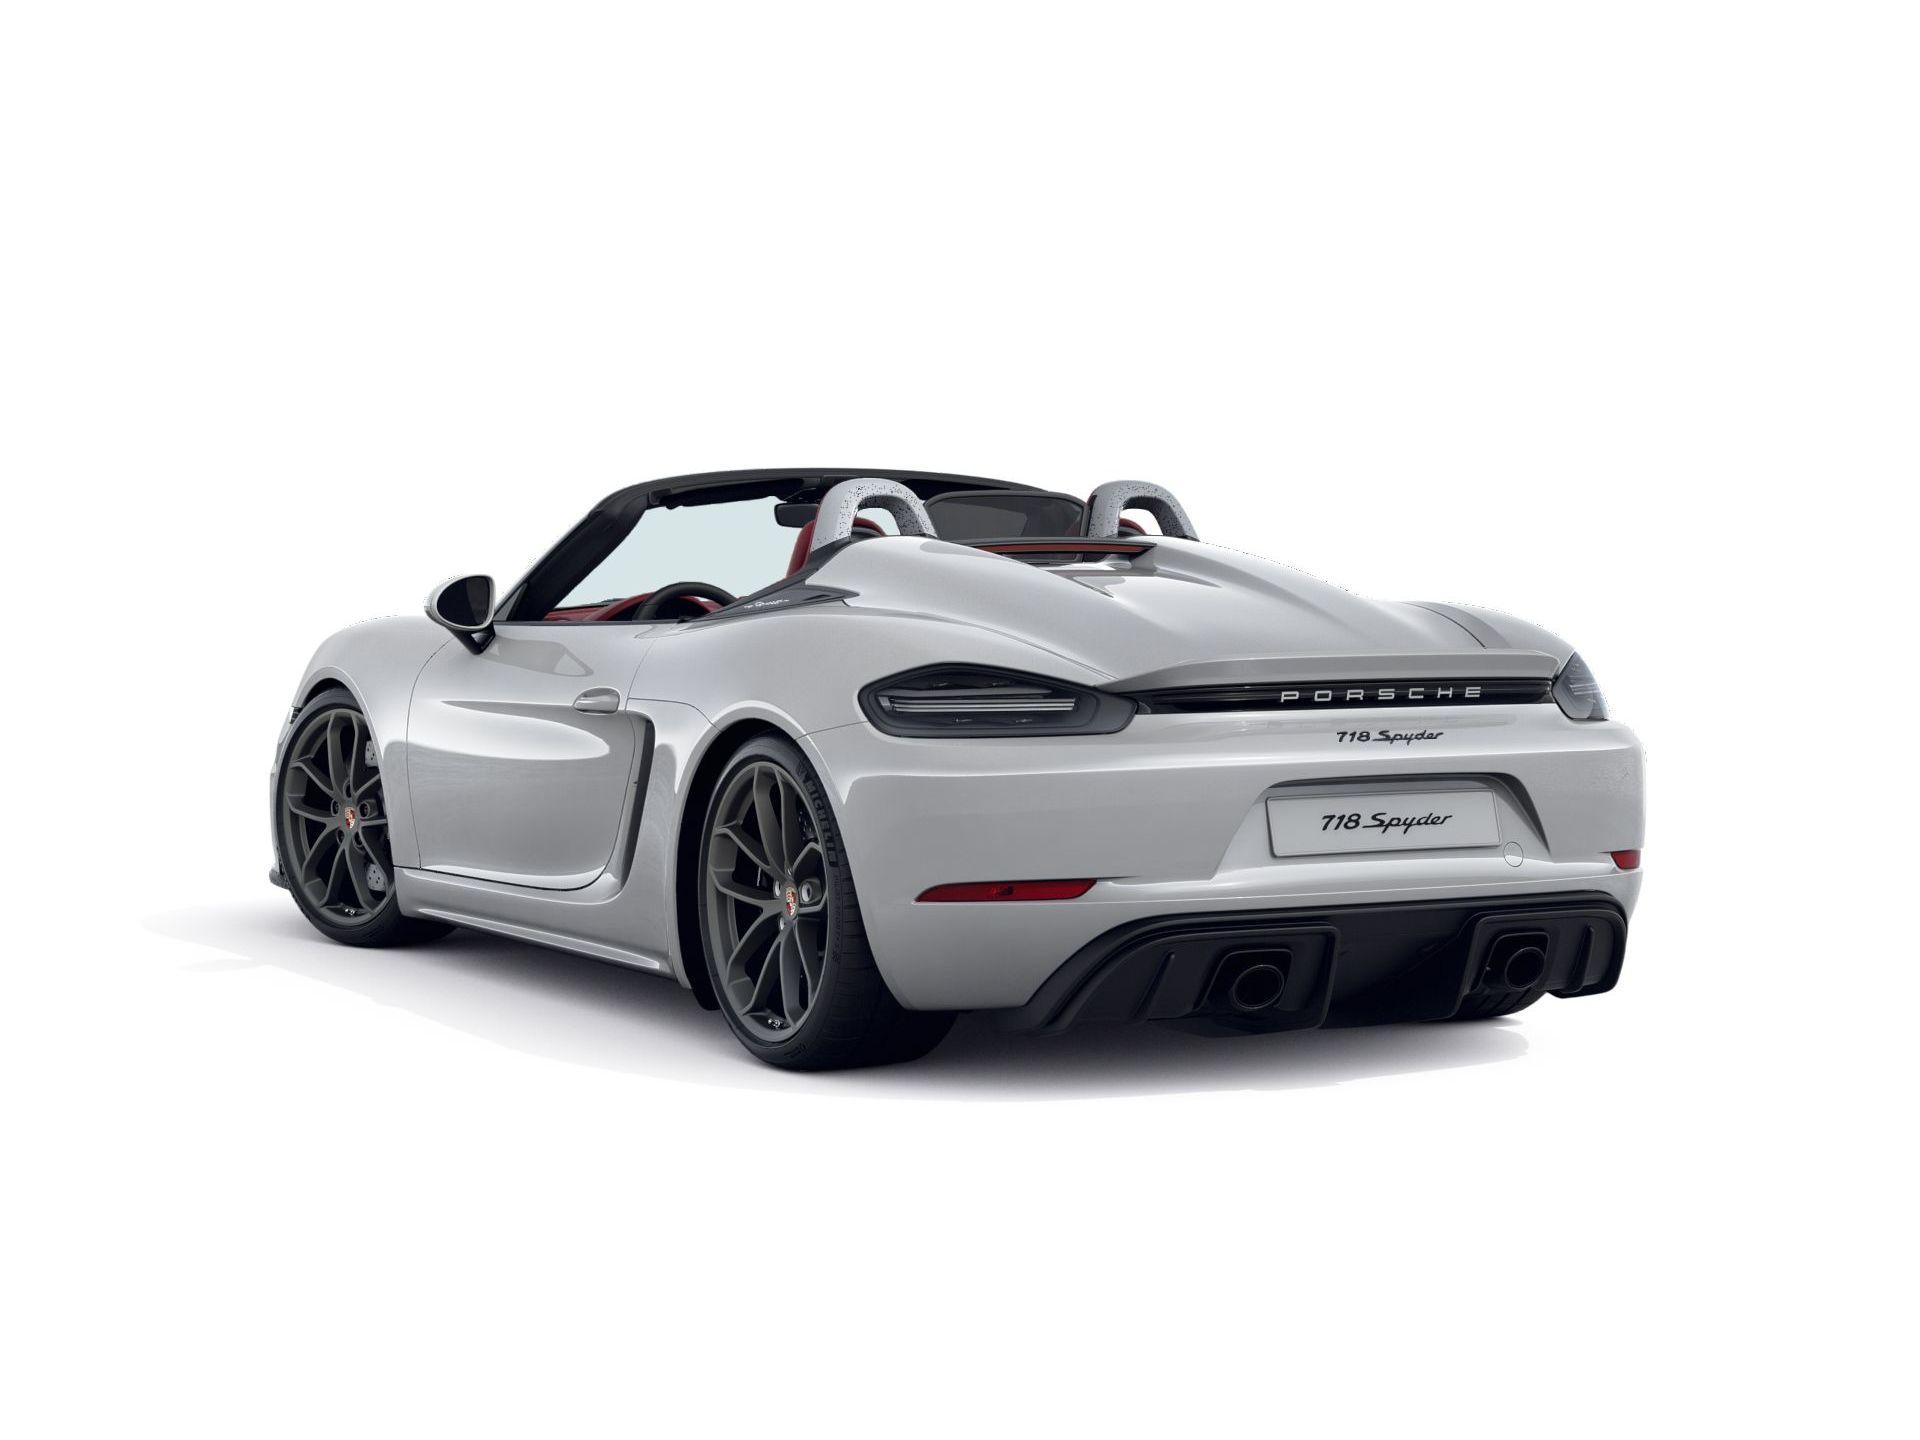 2022 Porsche 718 Spyder – 3